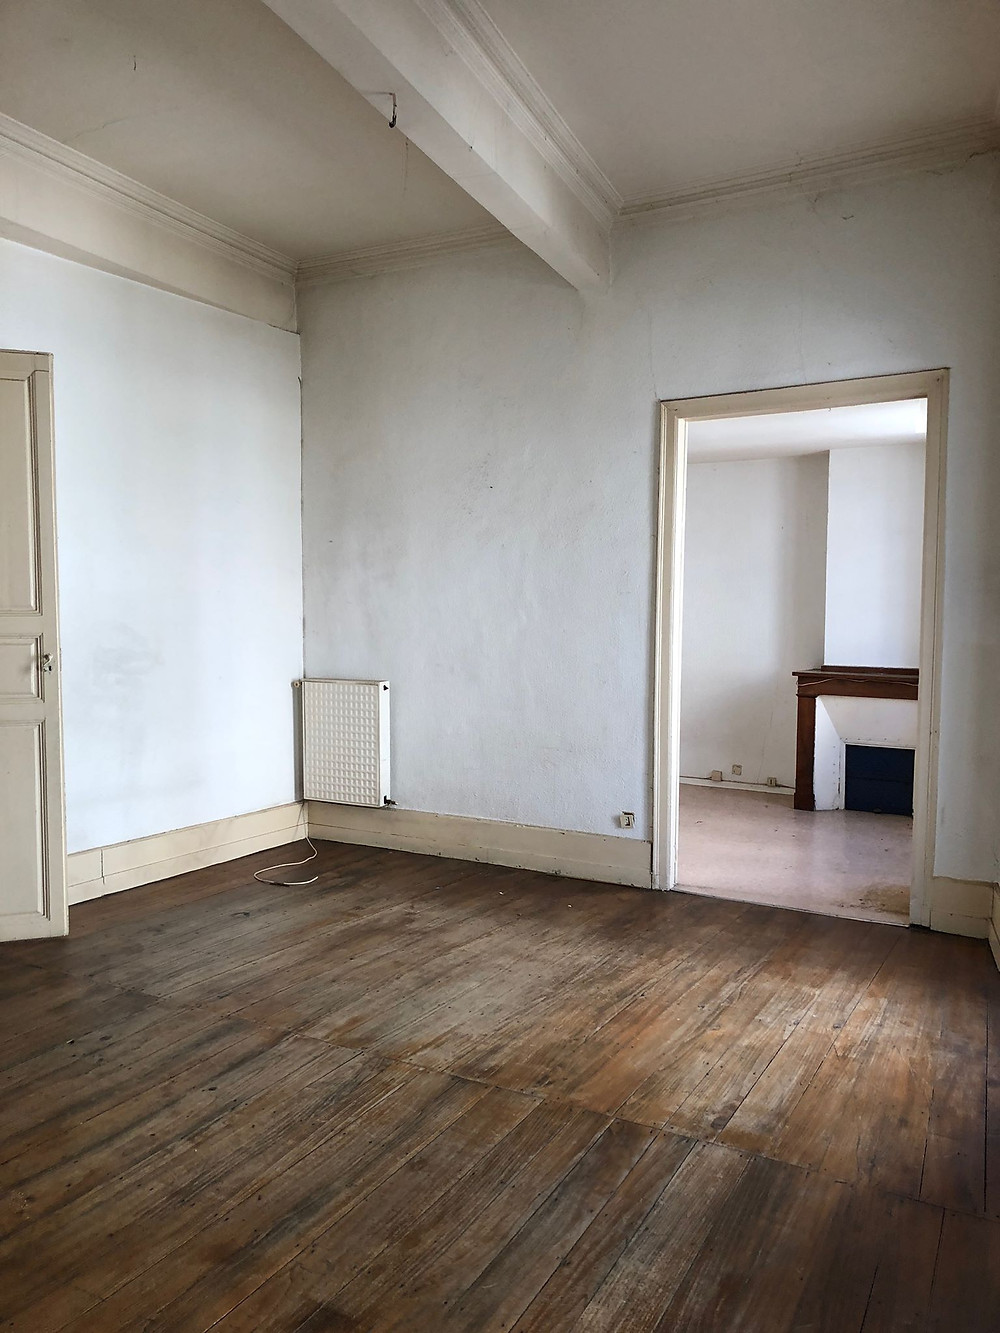 Club immobilier salon